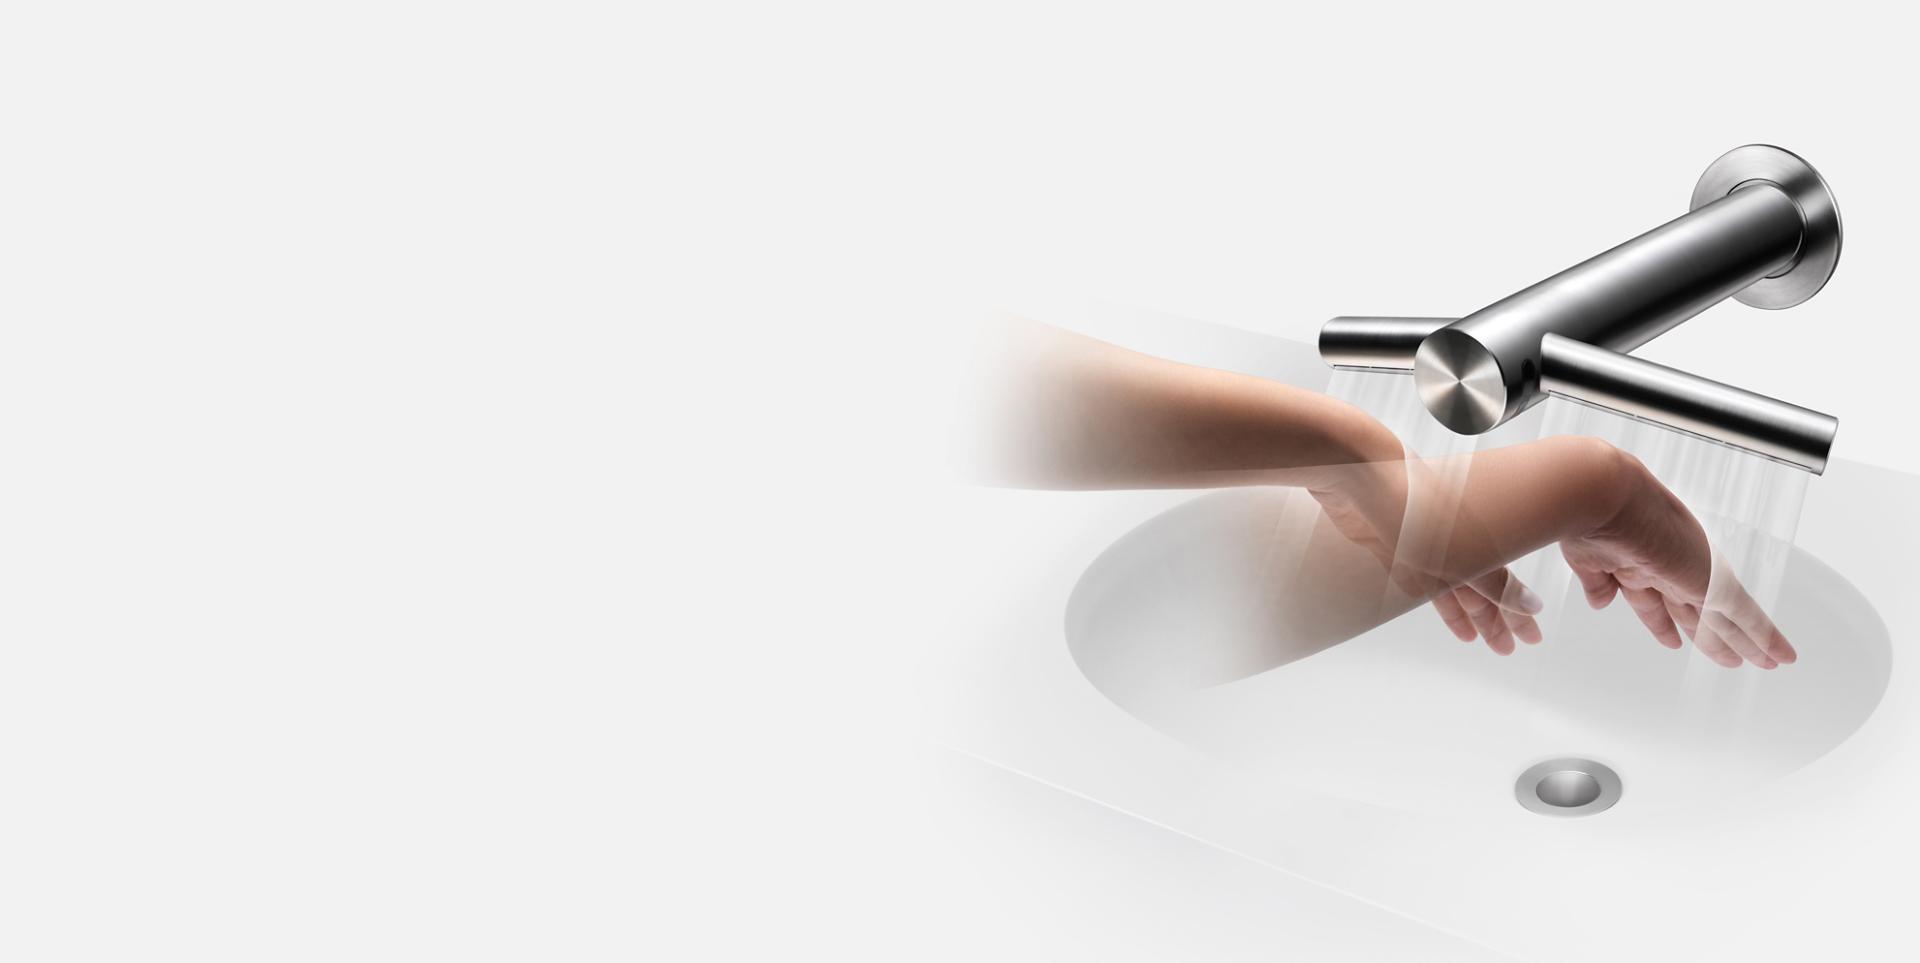 Hands beneath Dyson Airblade Wash+Dry hand dryer